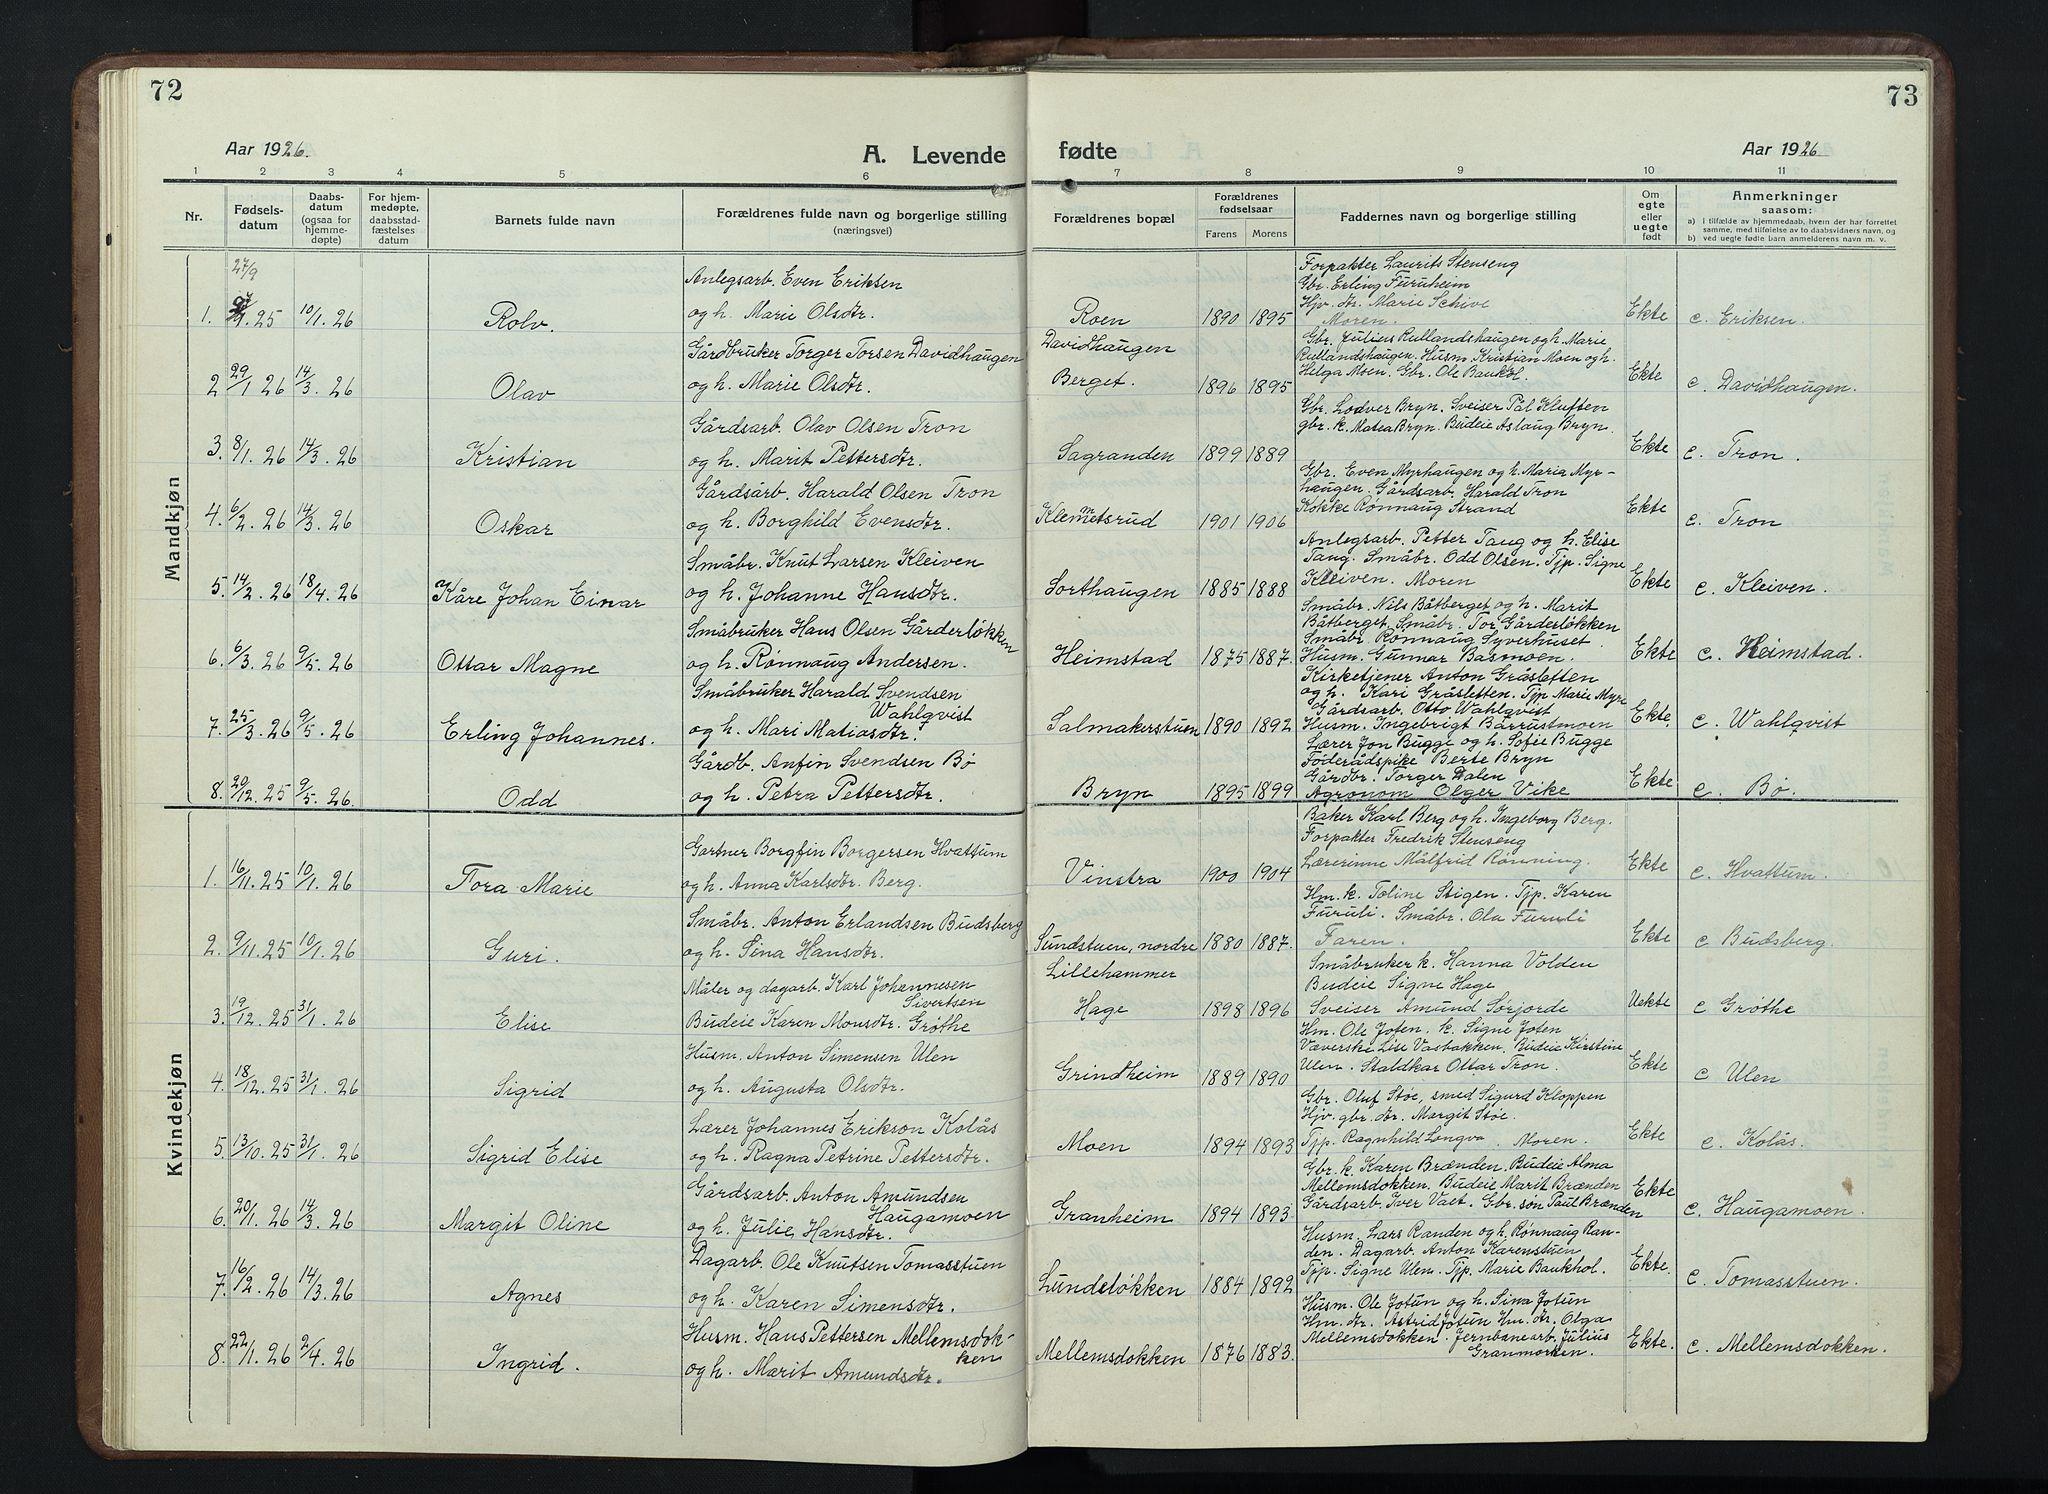 SAH, Nord-Fron prestekontor, Klokkerbok nr. 7, 1915-1946, s. 72-73